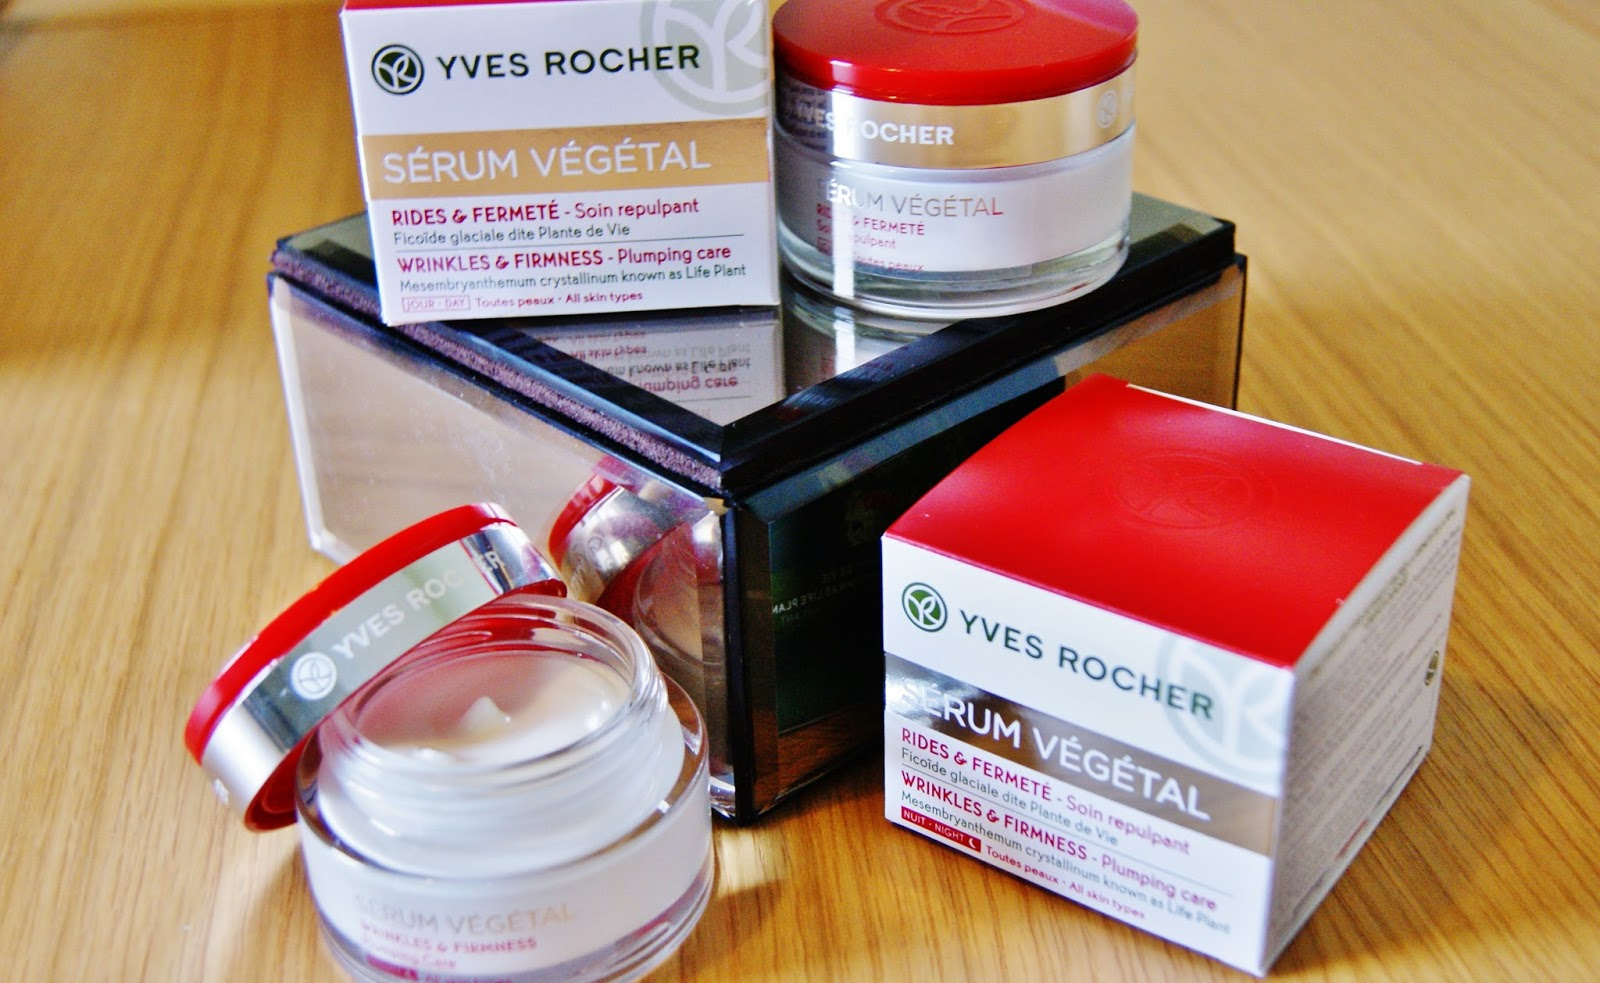 BEAUTY REVIEW: YVES ROCHER SERUM VEGETAL WRINKLES & FIRMNESS CREAMS